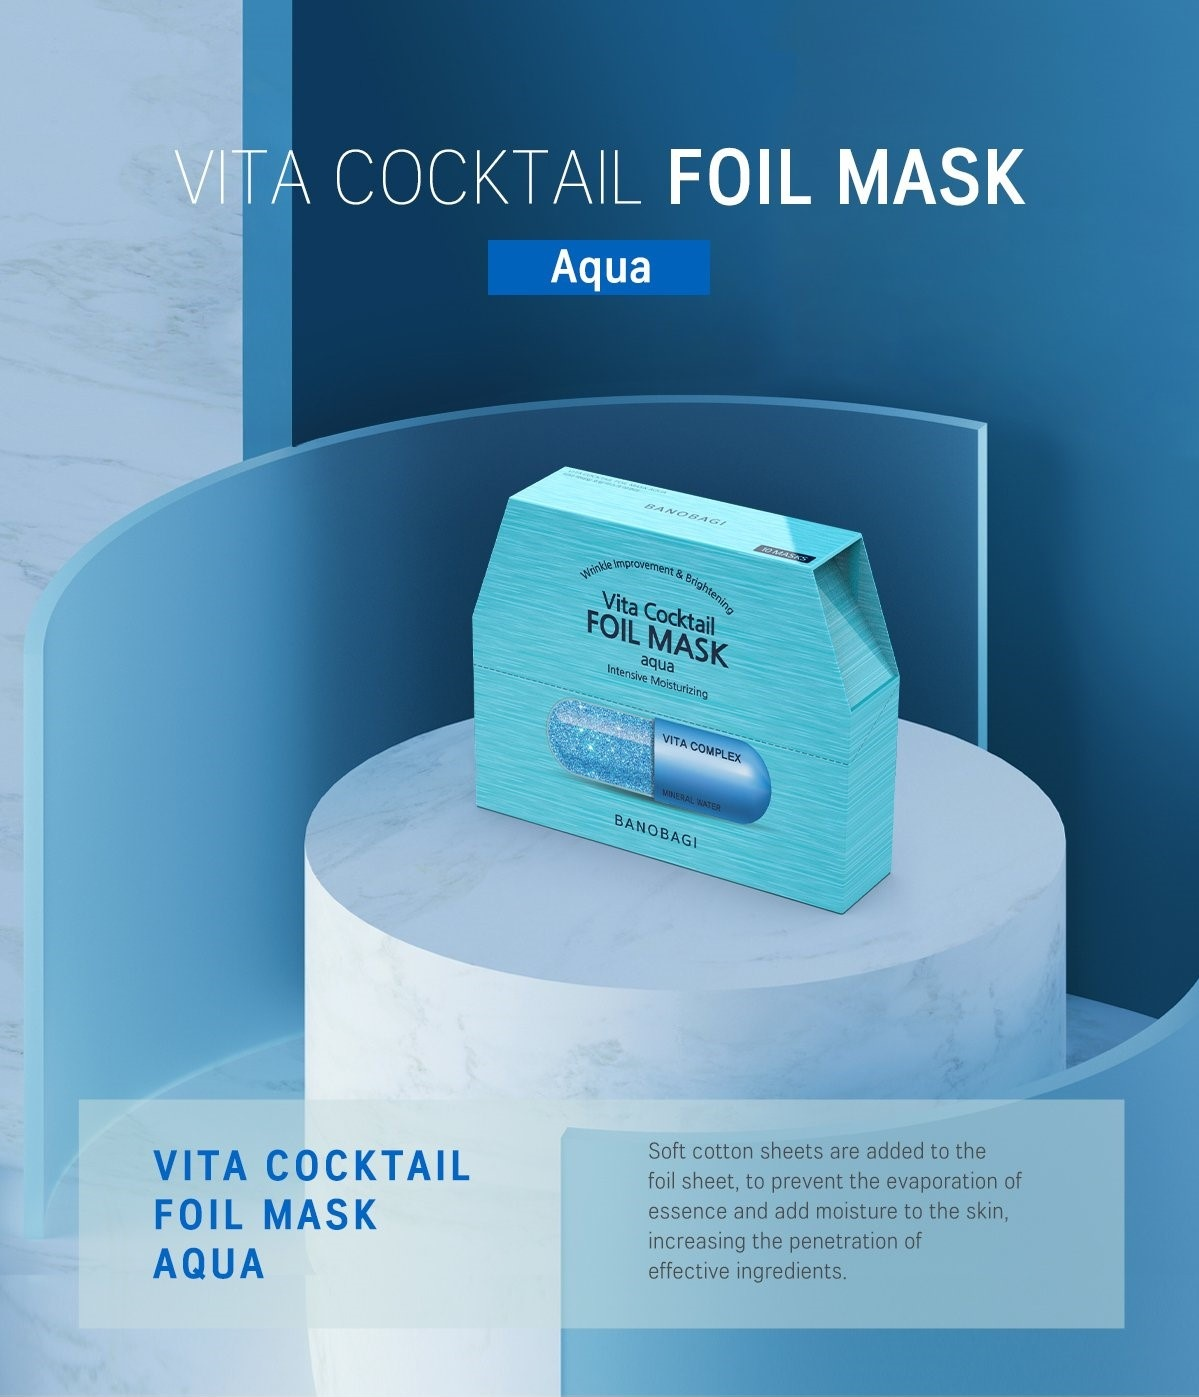 Vita Cocktail Foil Mask Aqua-2